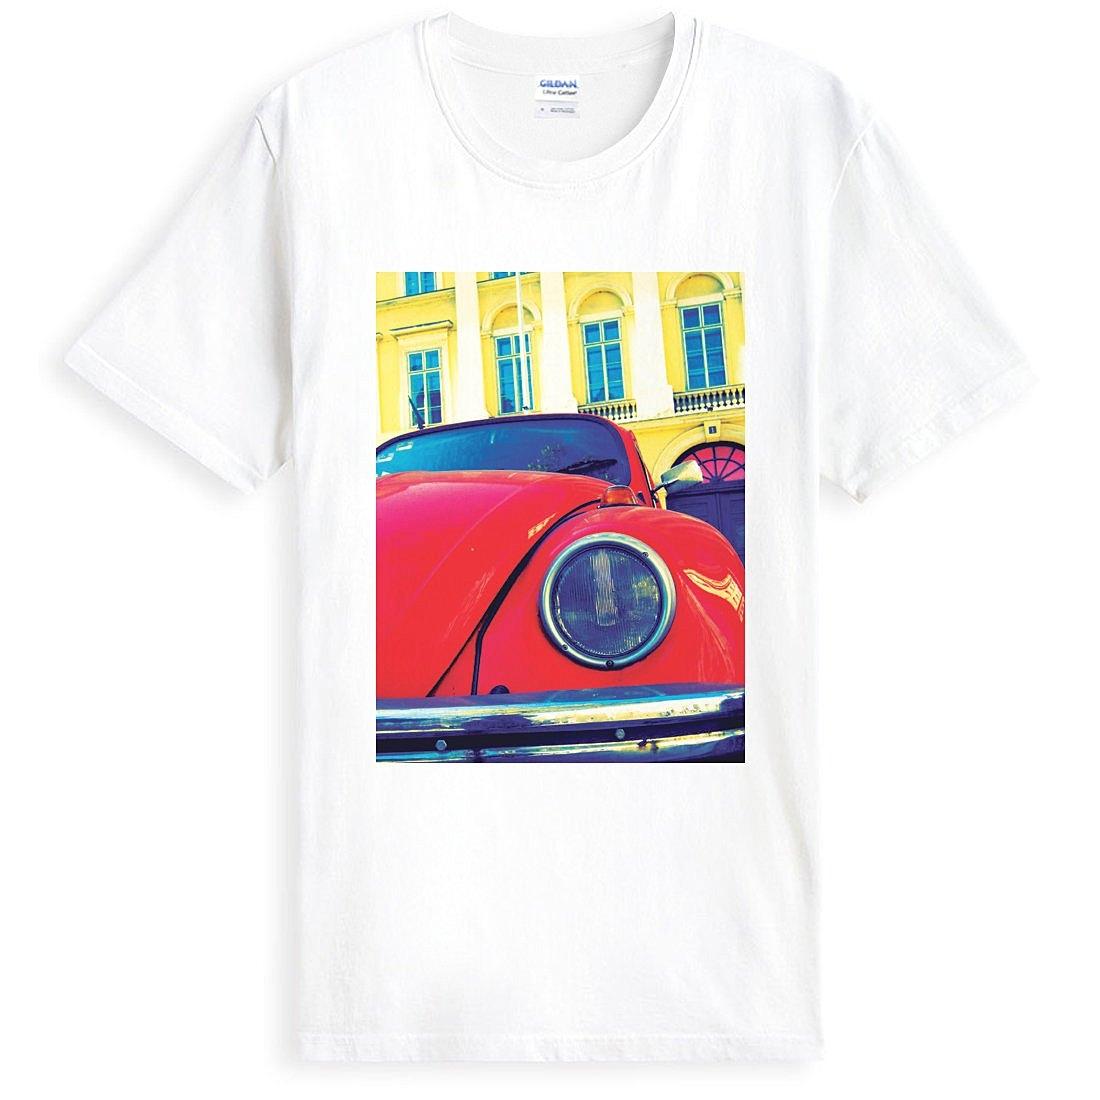 Lomo-Bug Life短袖T恤-白色 Lomography 照片 相片 金龜車 風景 樂團 現貨